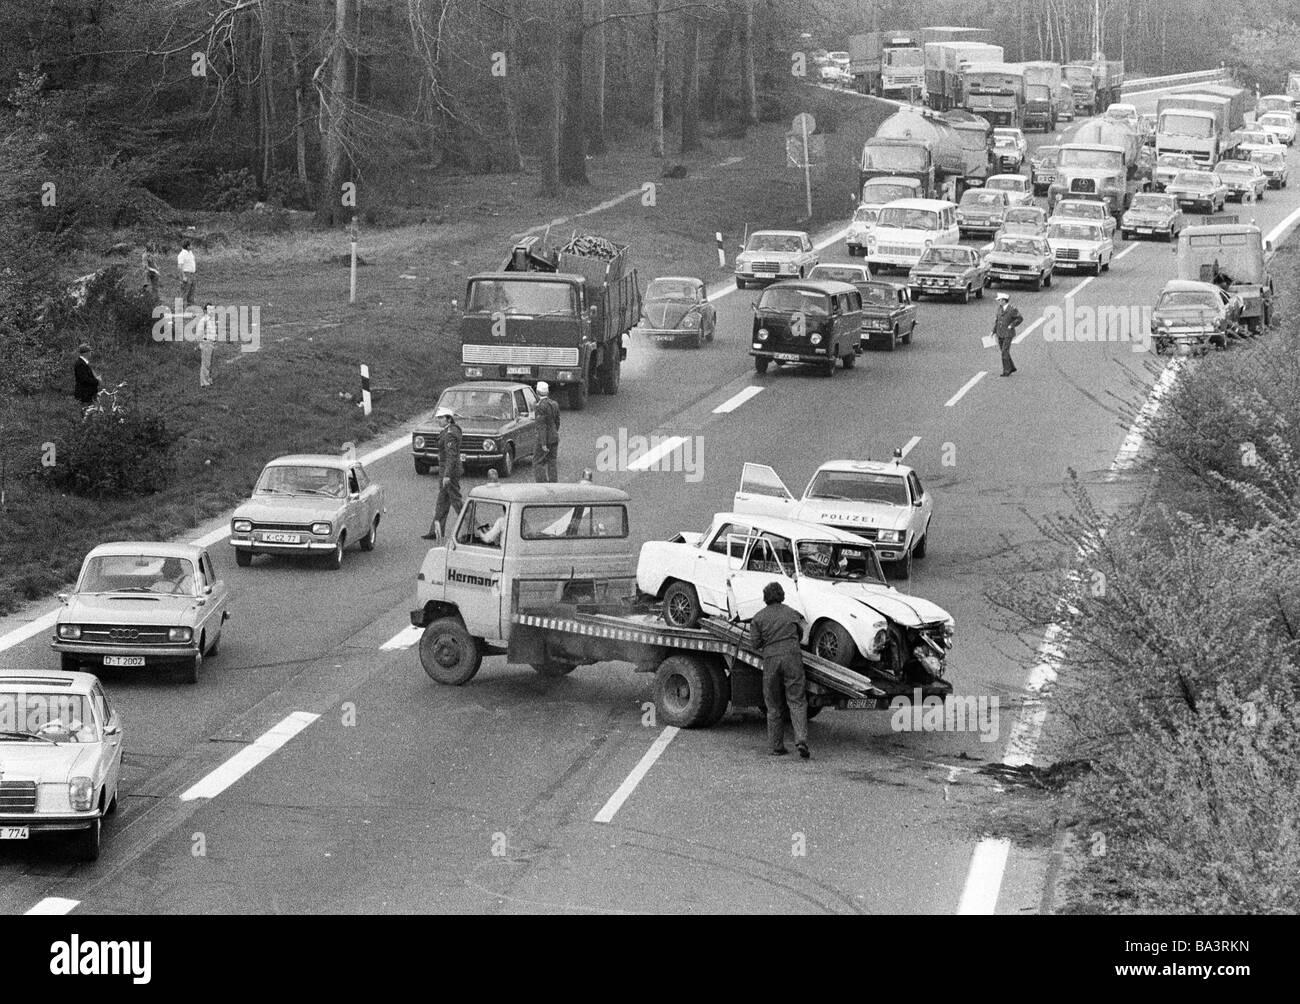 Car Accident Luton